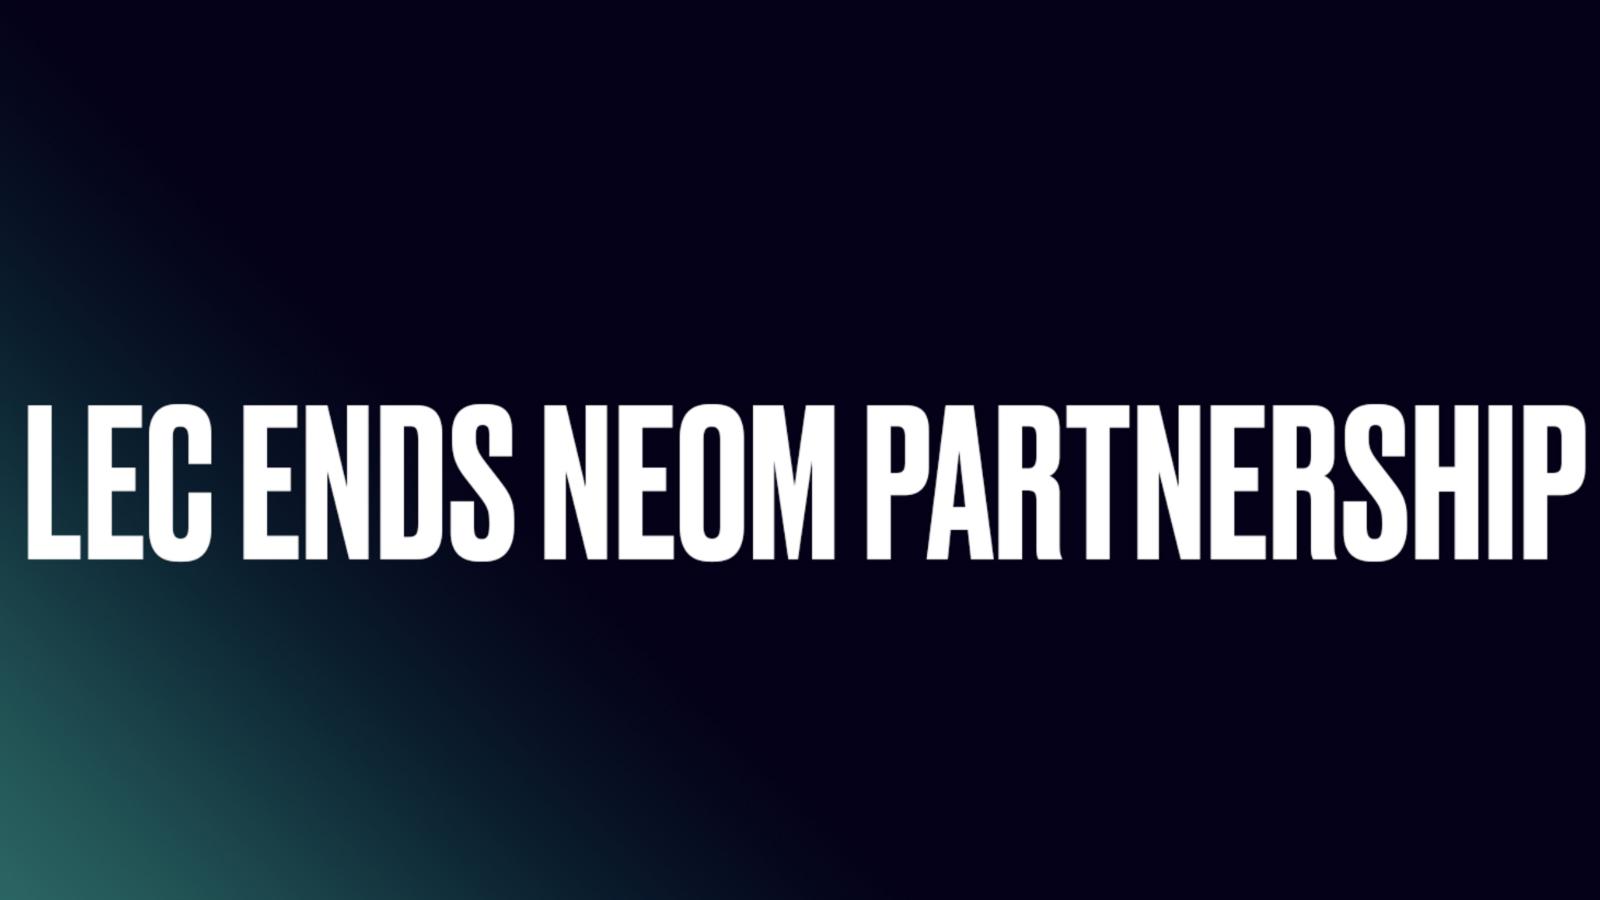 LEC ends NEOM Partnership